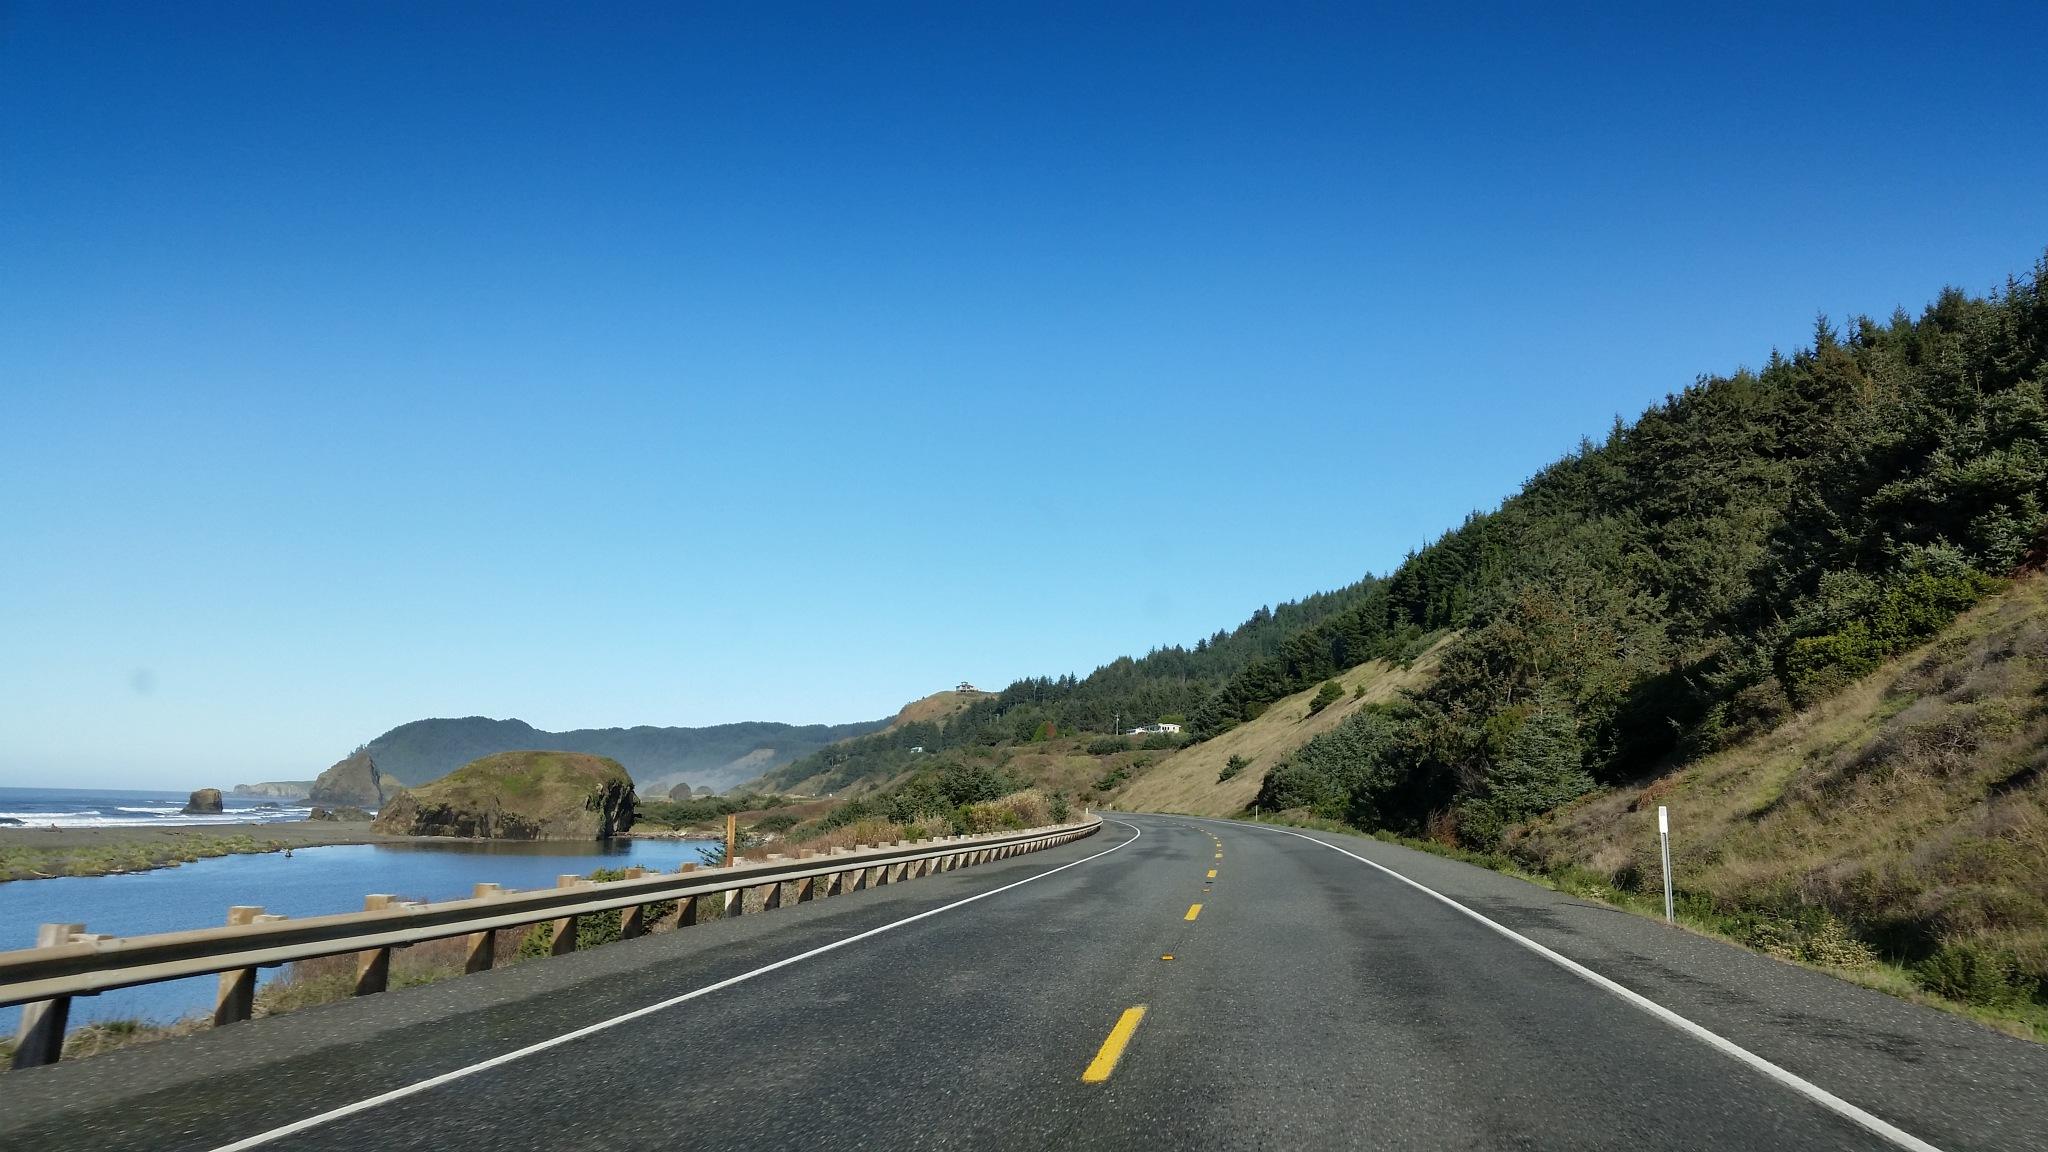 Highway 101 Oregon coast Bandon Oregon by B56